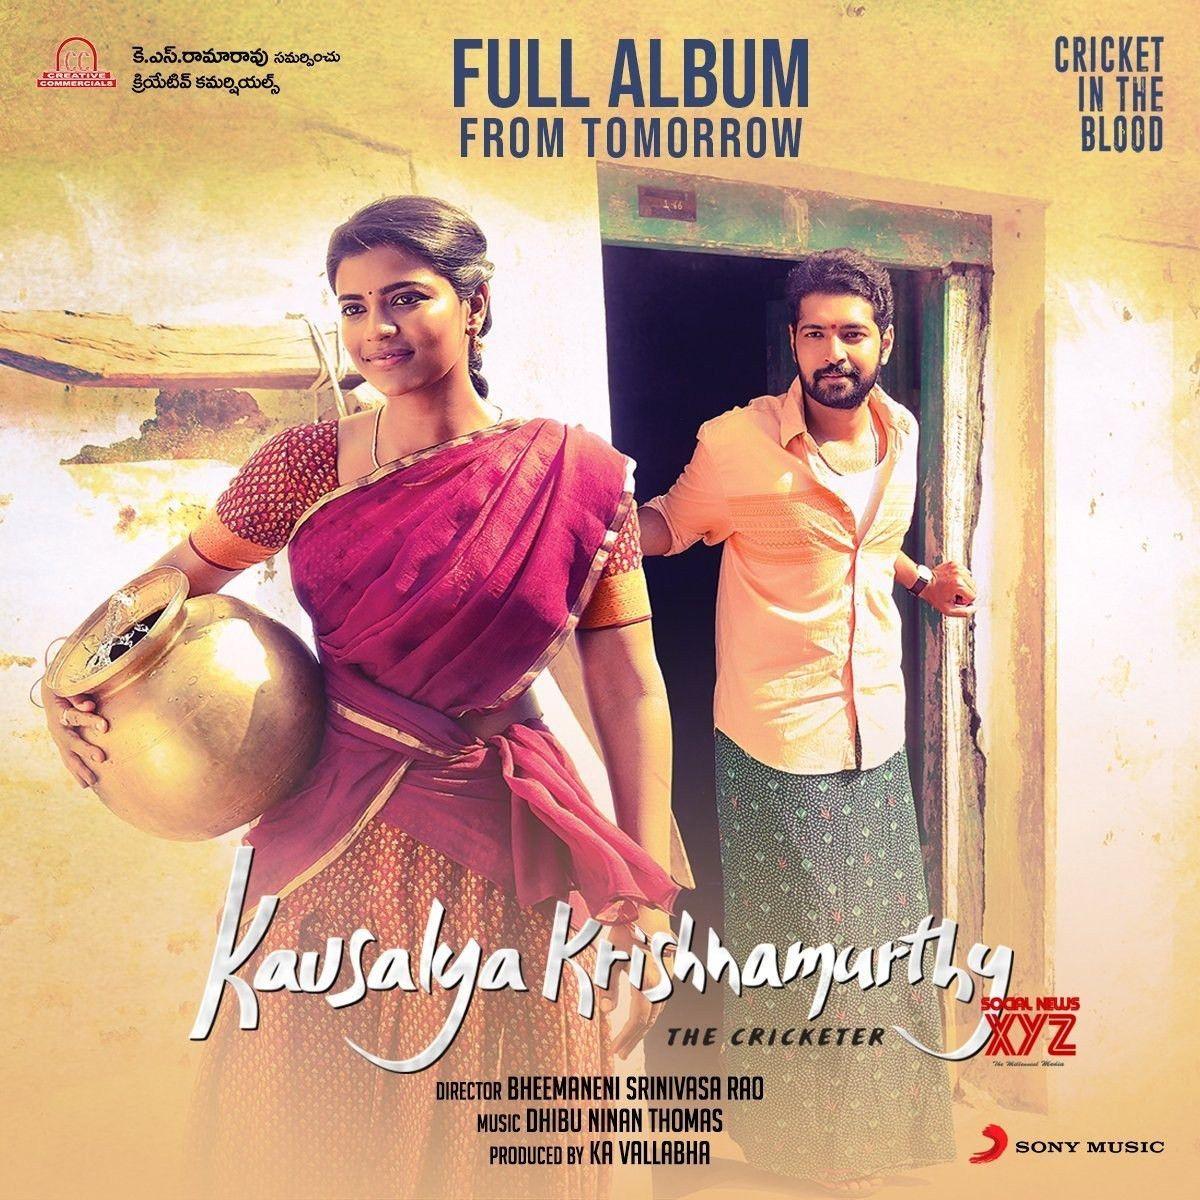 Kousalya Krishnamurthy 2019 Telugu 720p Hdrip 1 4gb Esubs Album Releases Movies To Watch Online Telugu